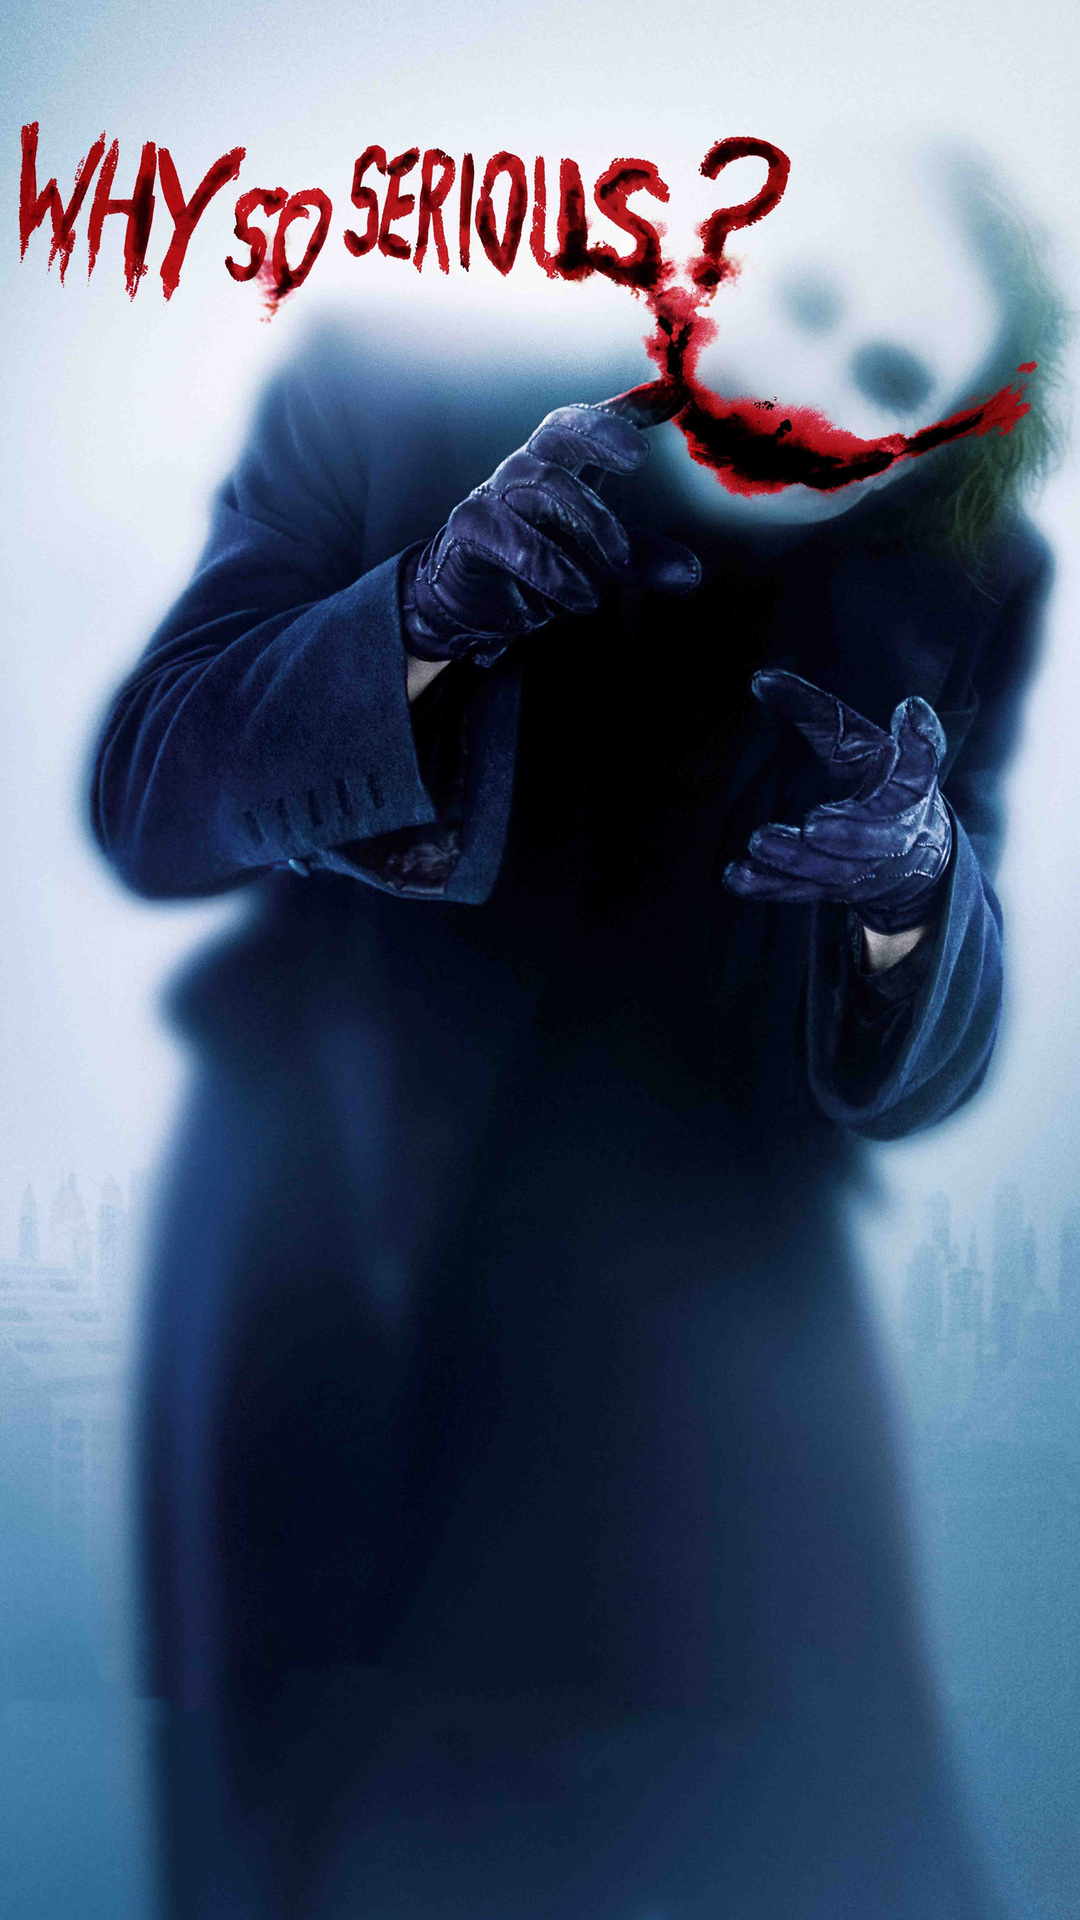 Joker Wallpaper Iphone 6 Plus 28 Images Iphone 6 Plus